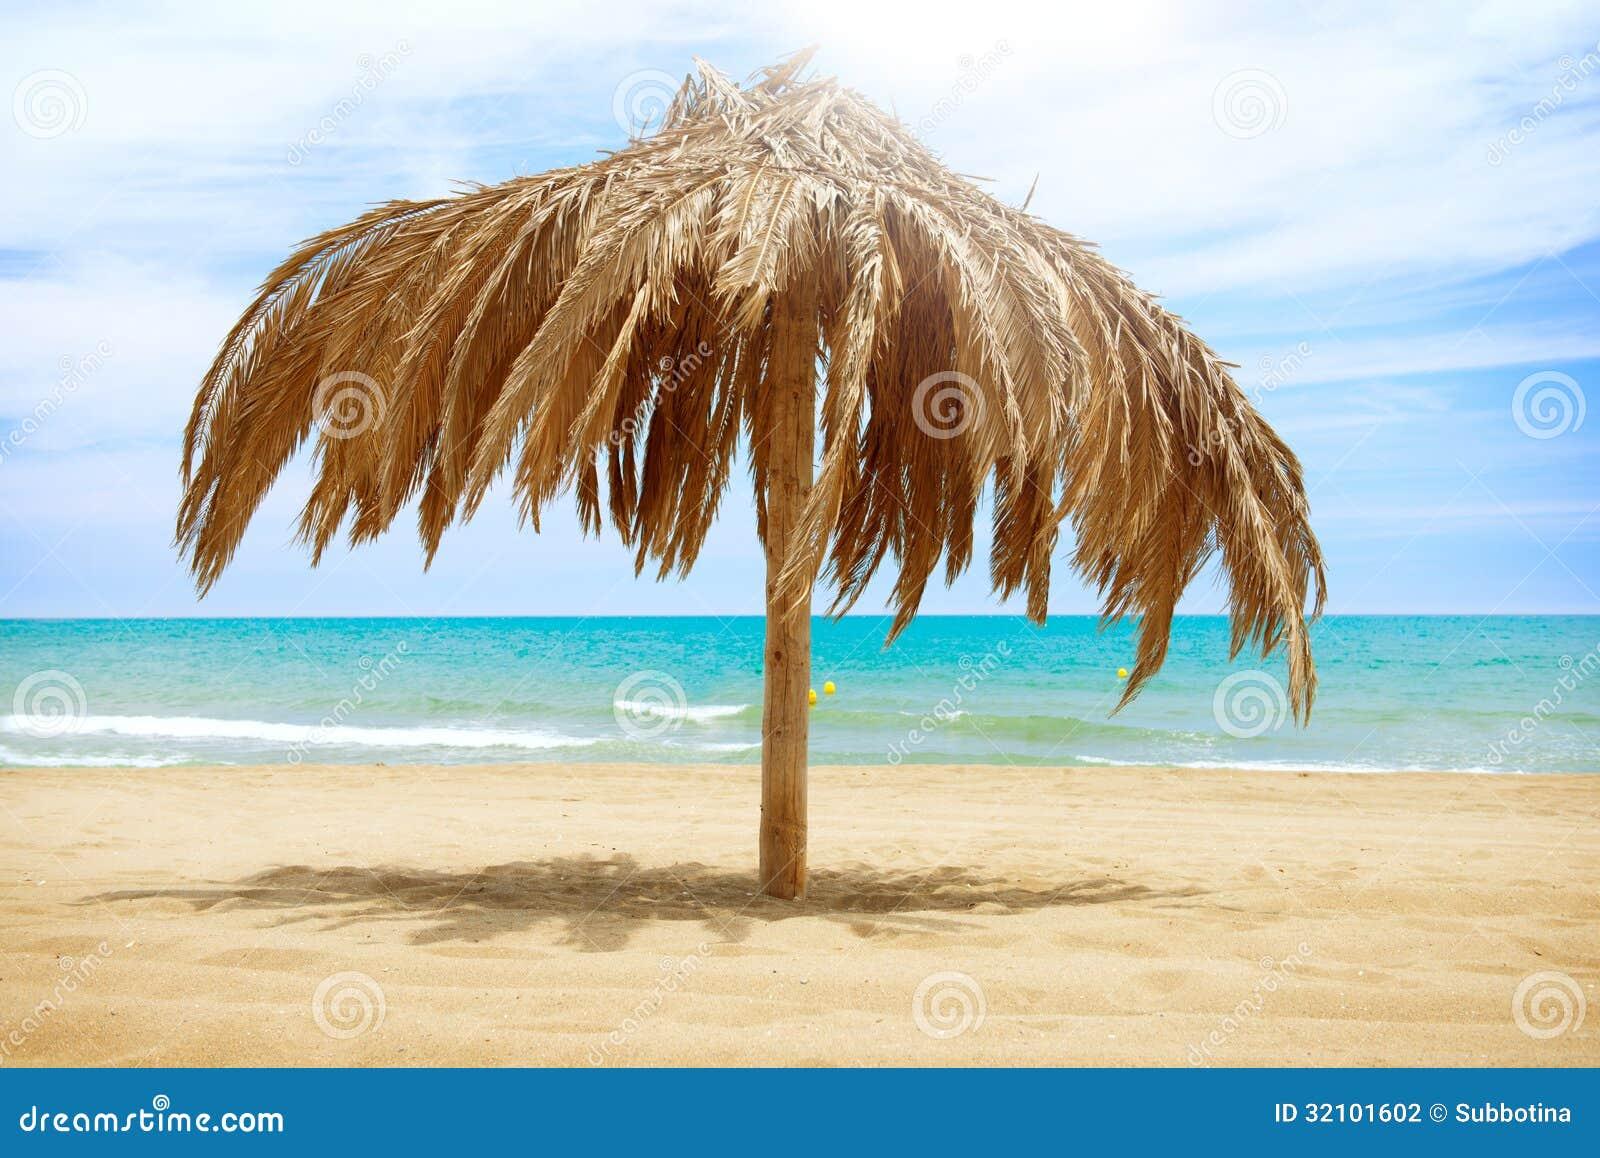 Sun Roof Beach Umbrella